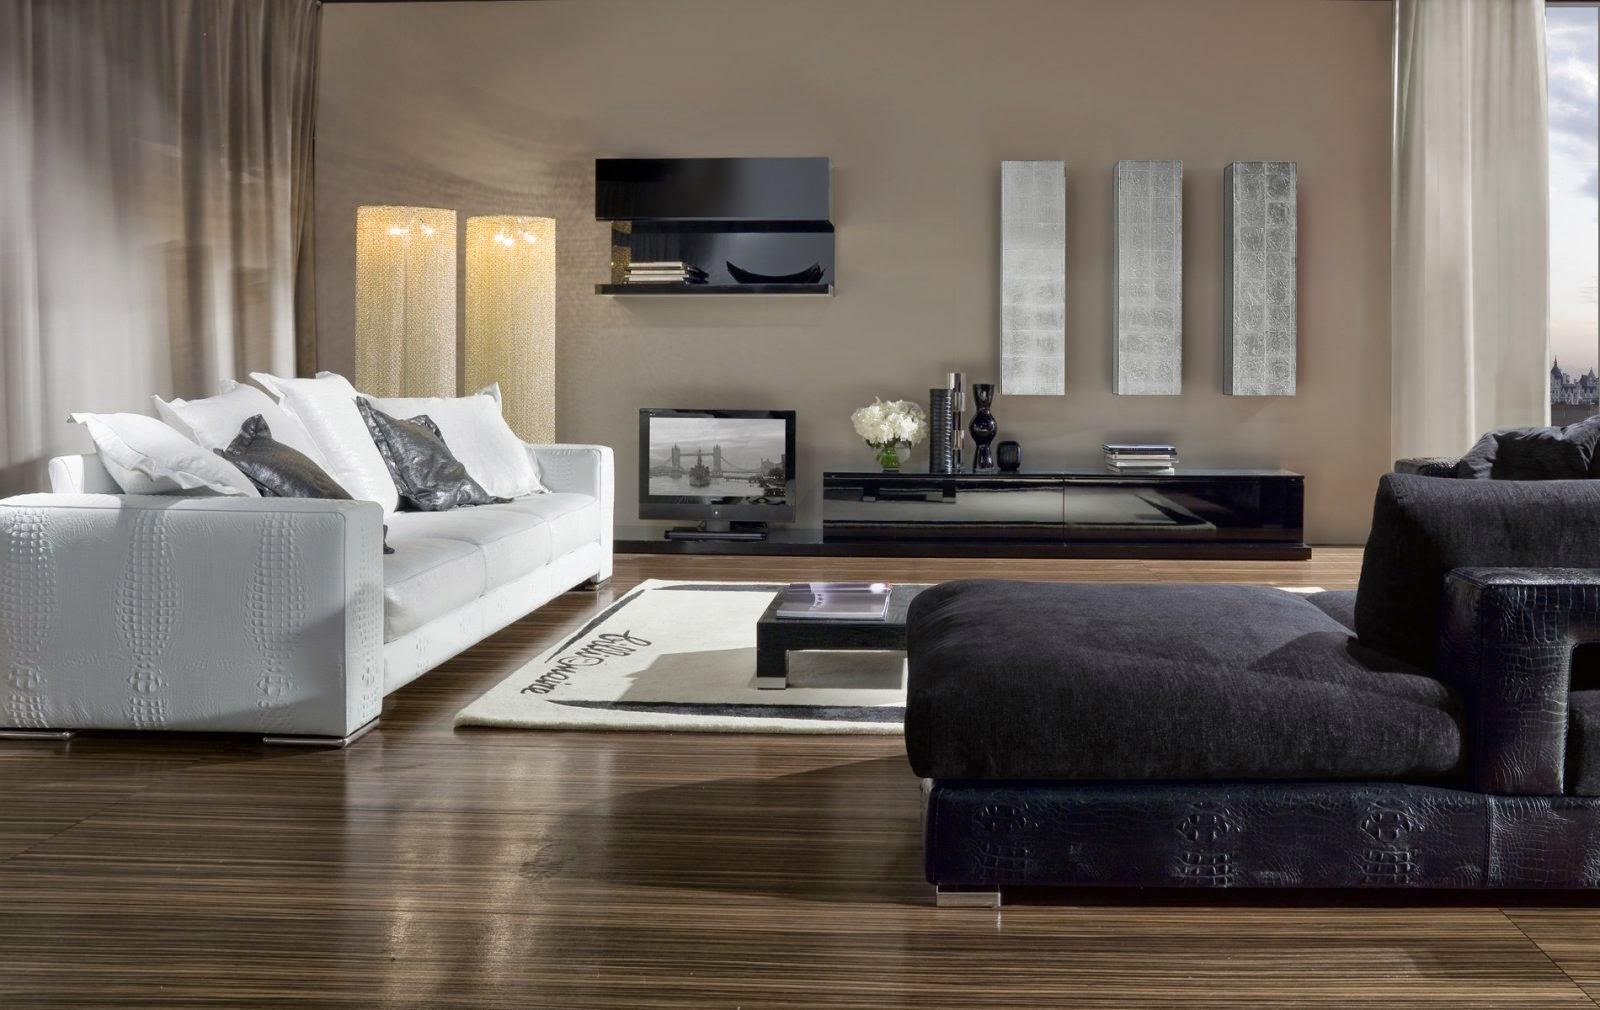 metamorphose concept - lifestyle blog: billionarie - il lusso in ... - Arredo Bagno Chateau D Ax